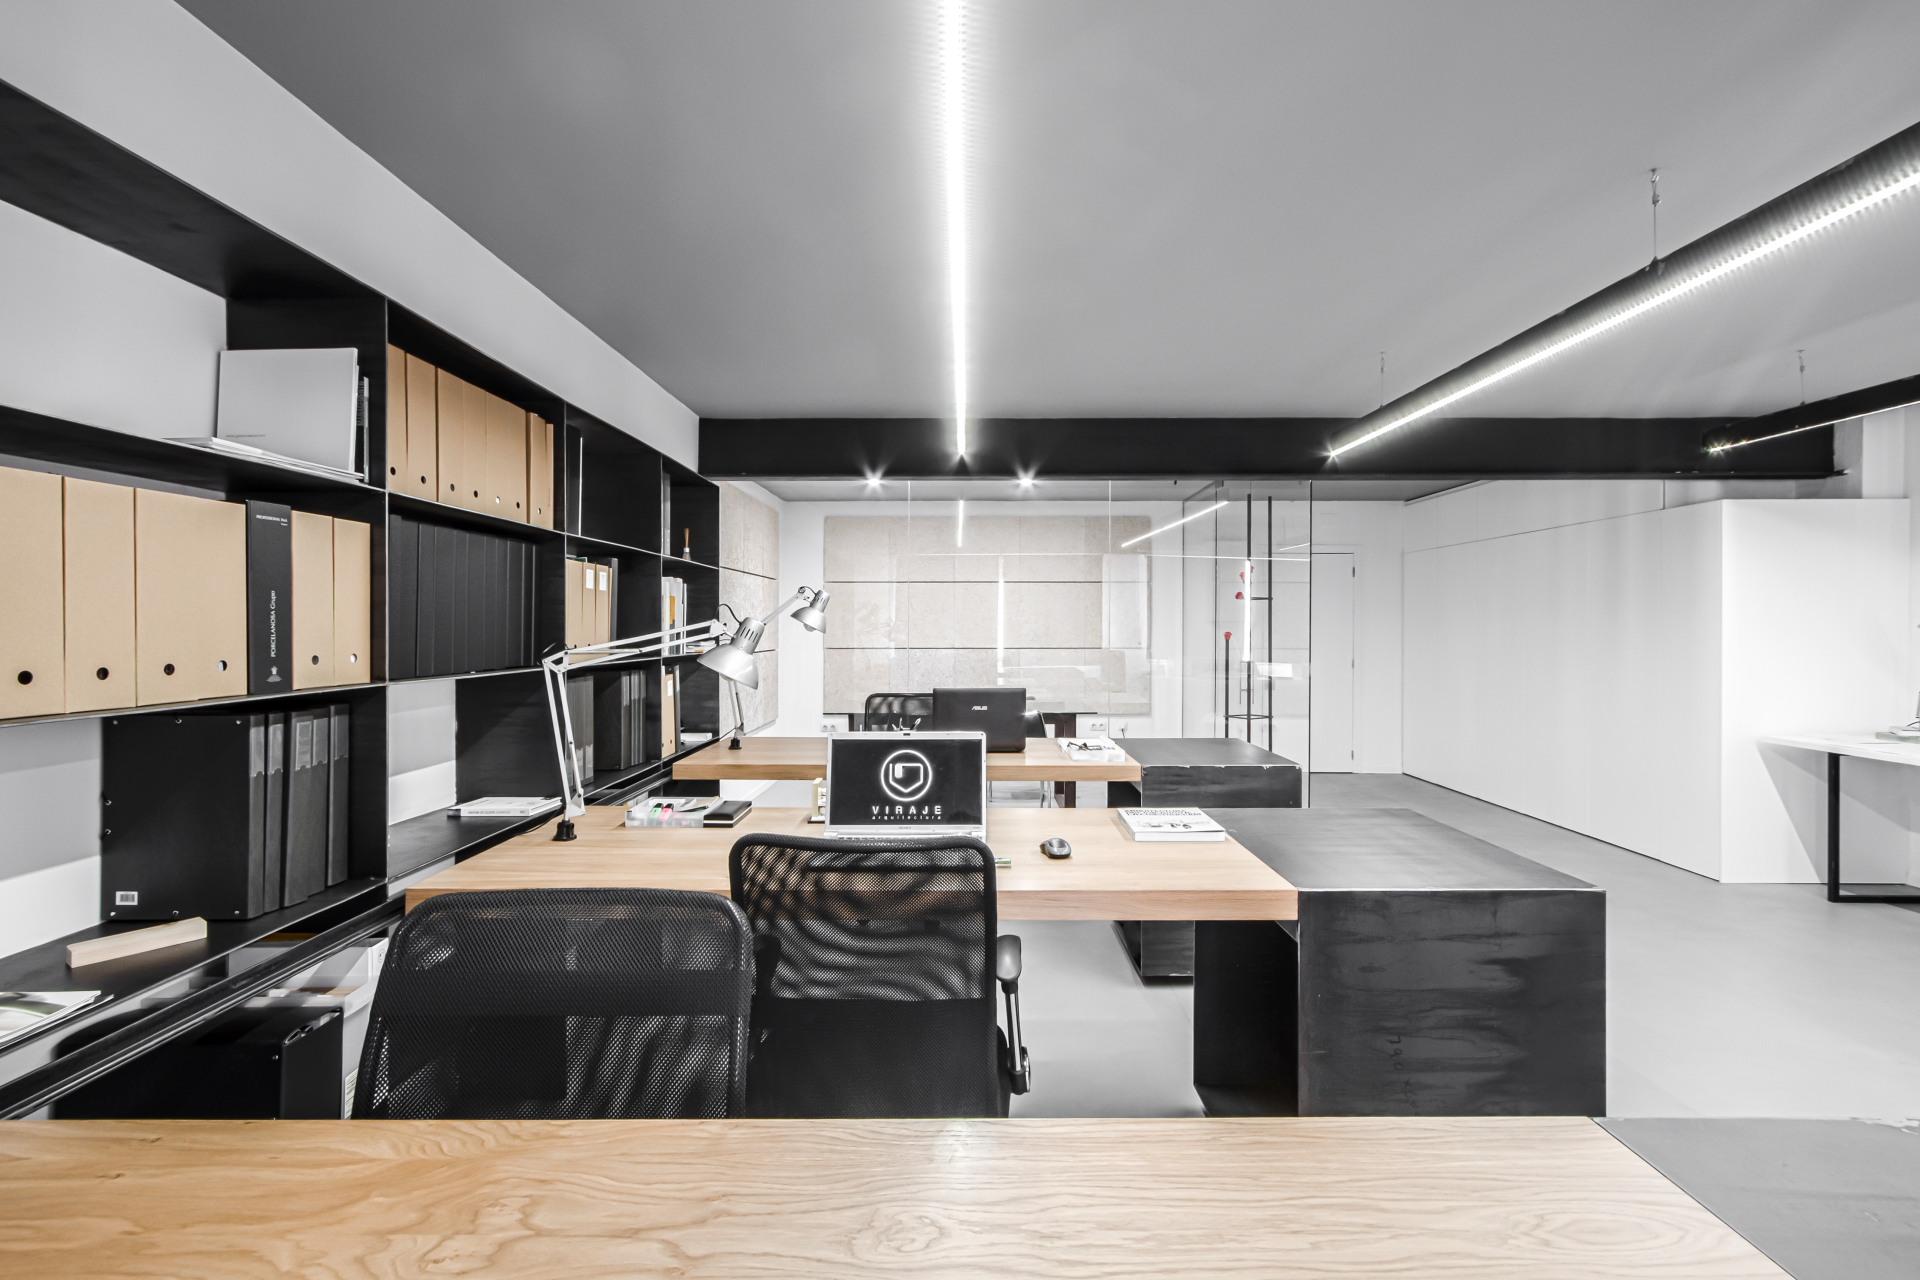 Estudio viraje valencia viraje arquitectura fotograf a arquitectura - Estudios arquitectura bilbao ...